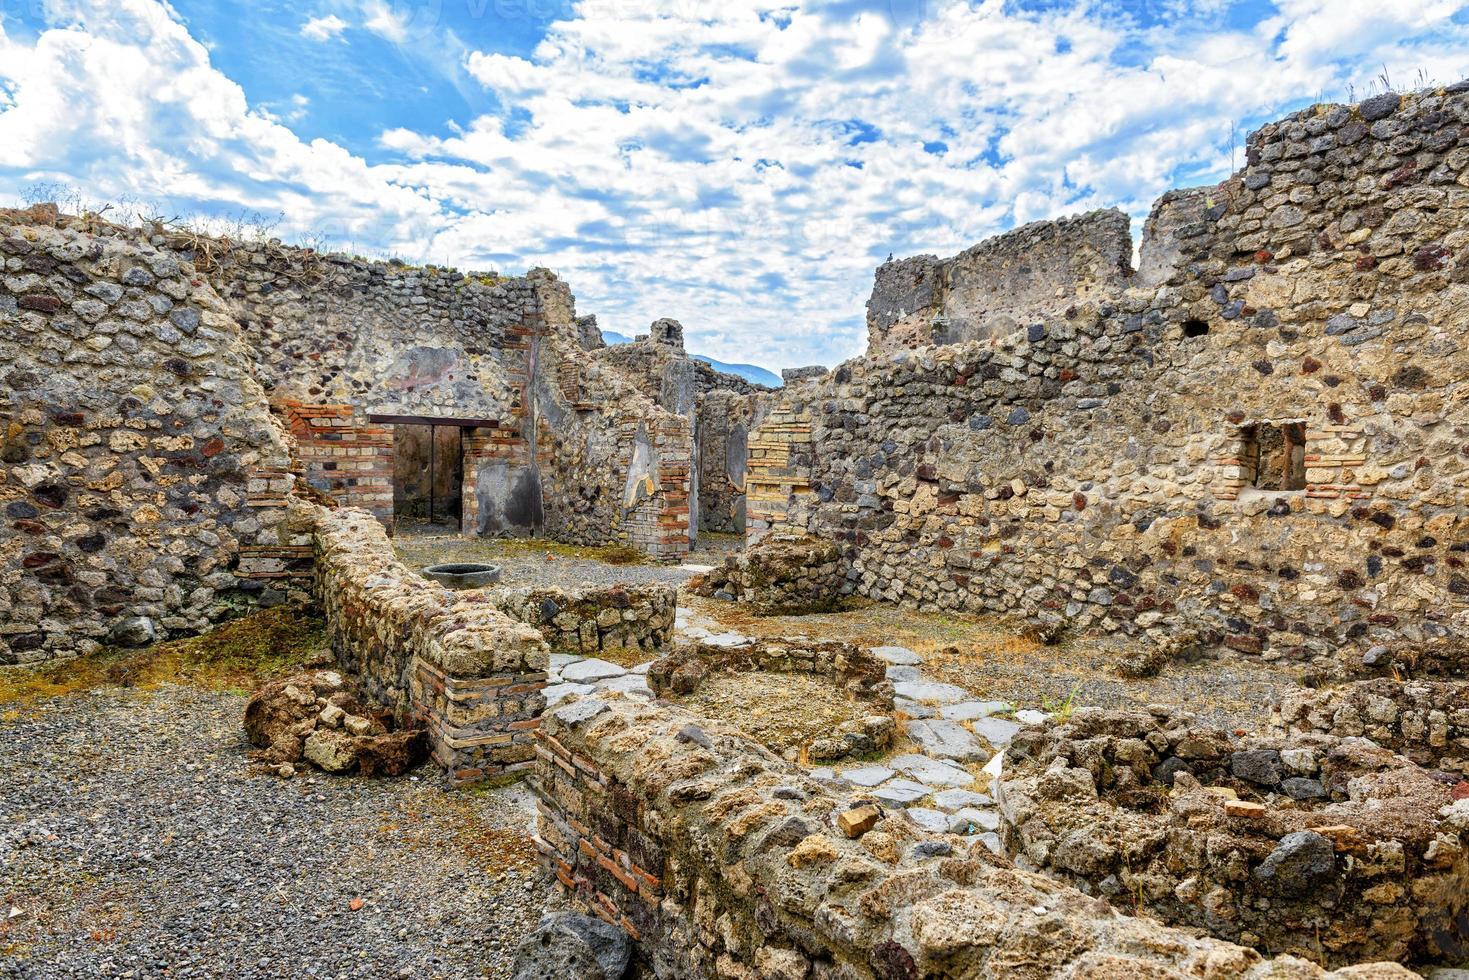 rovine di una casa a Pompei, Italia foto